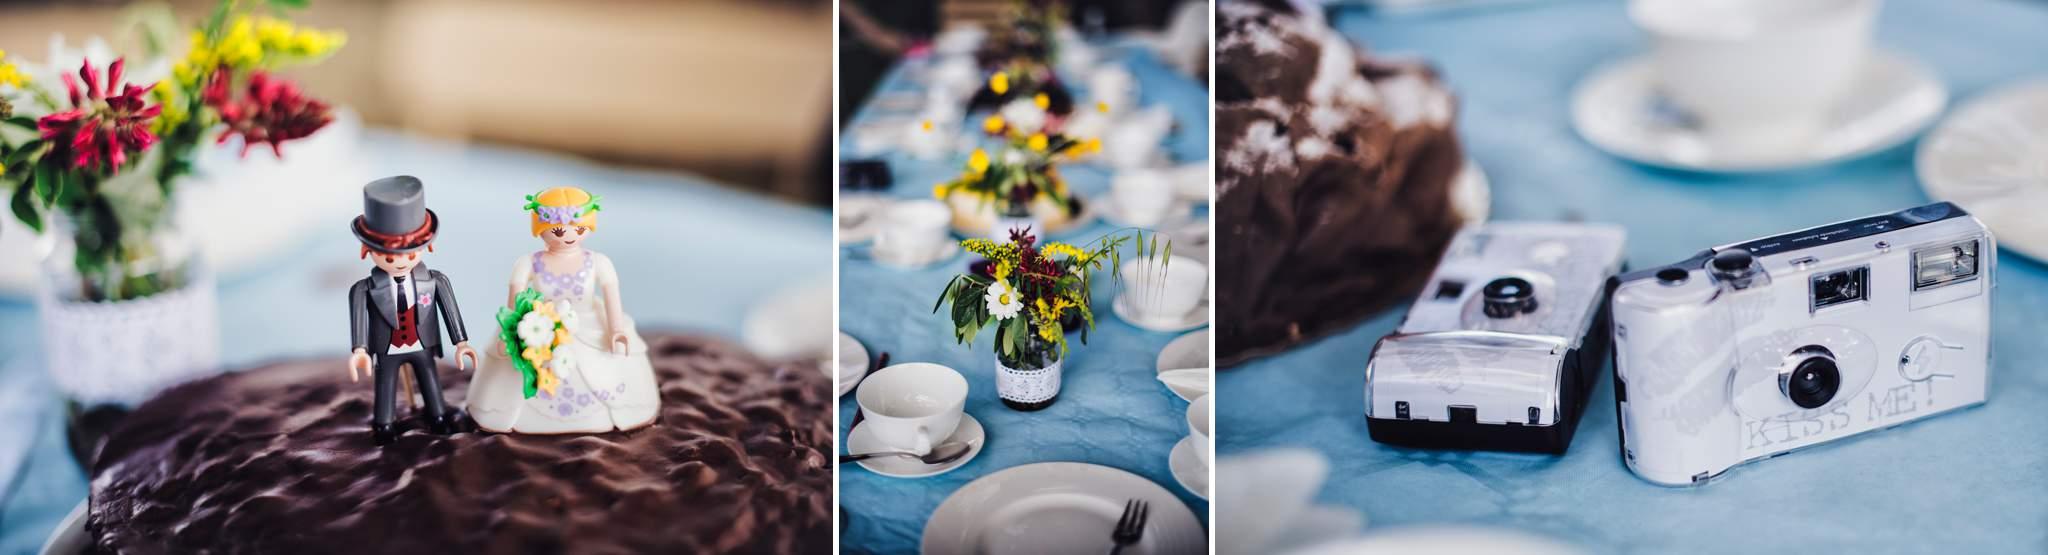 38wedding-photographer-tuscany-siena